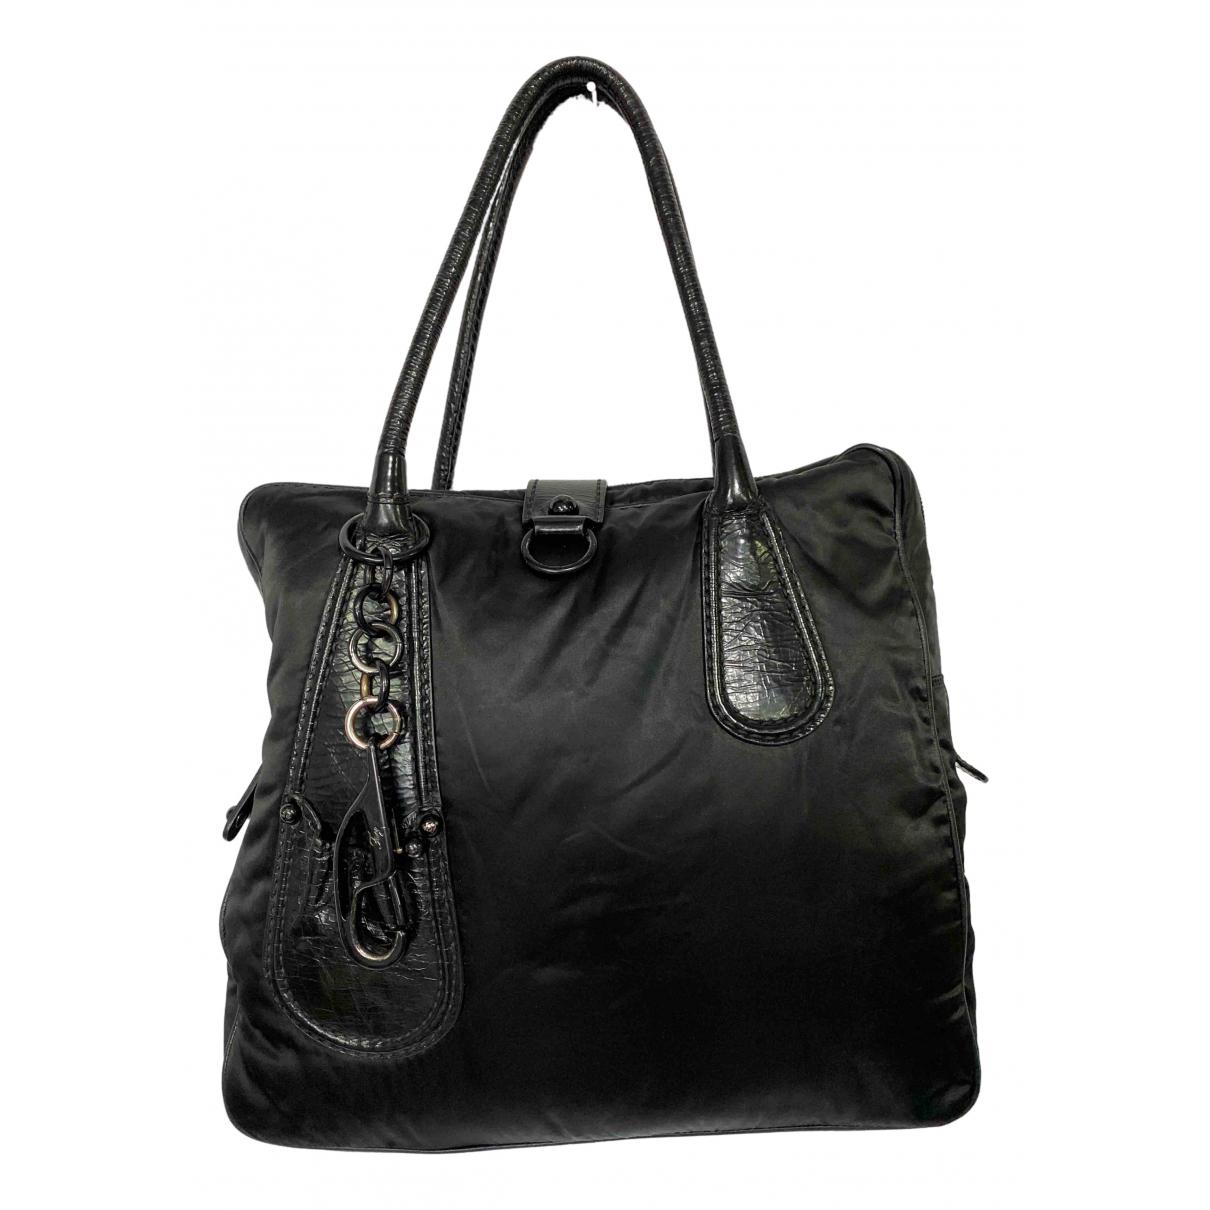 Fay \N Black Cloth handbag for Women \N